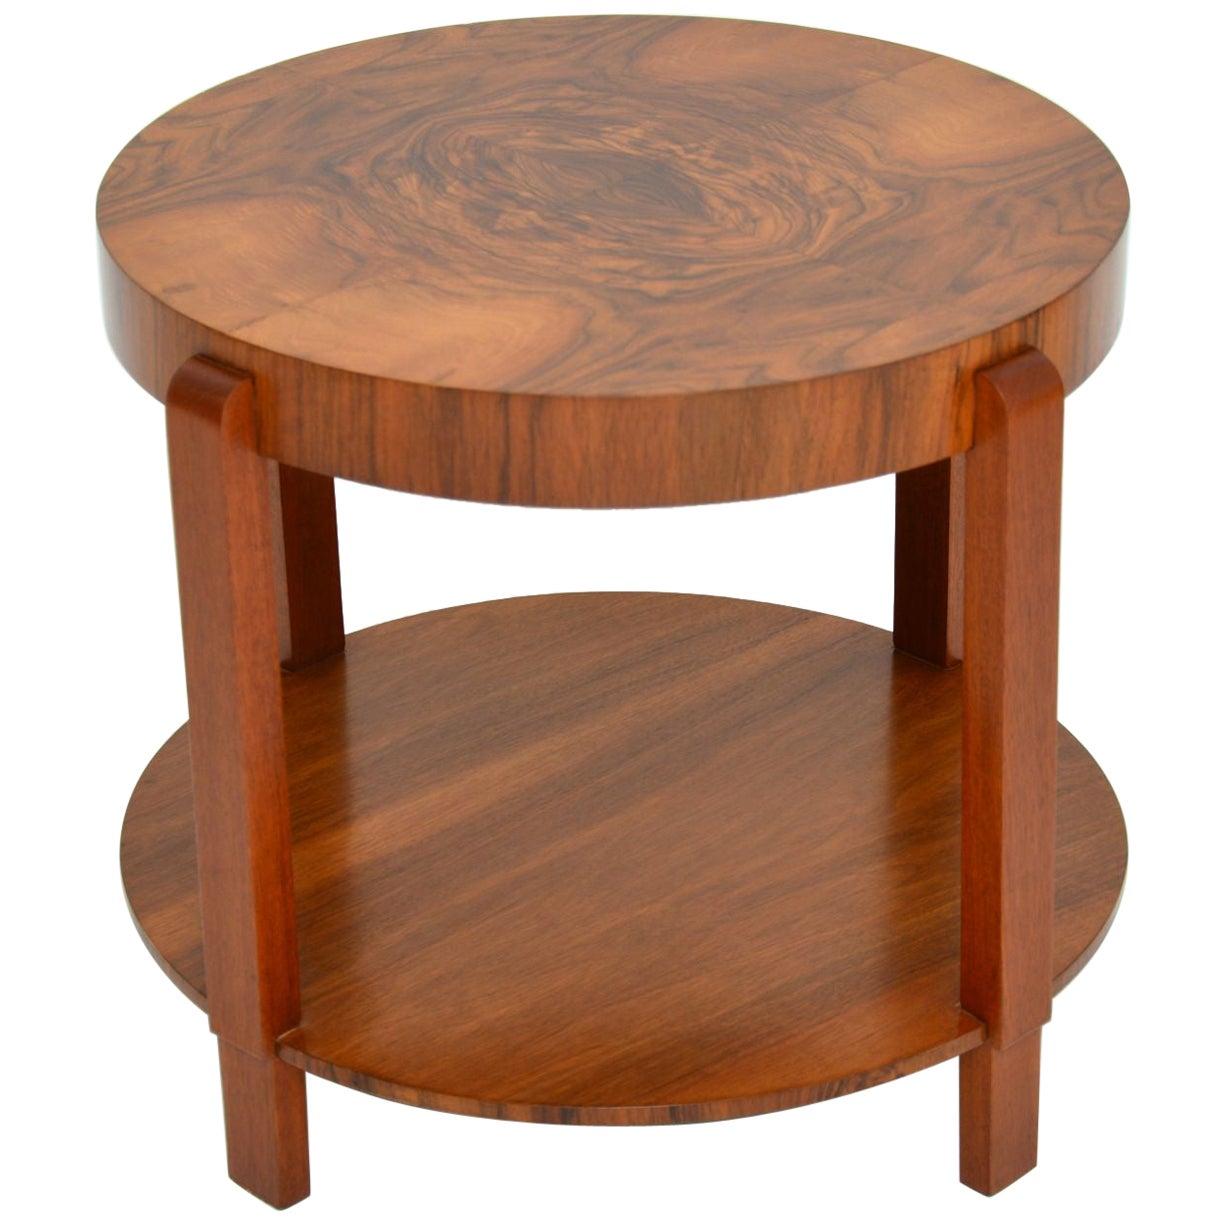 1920s Art Deco Period Walnut Coffee Table